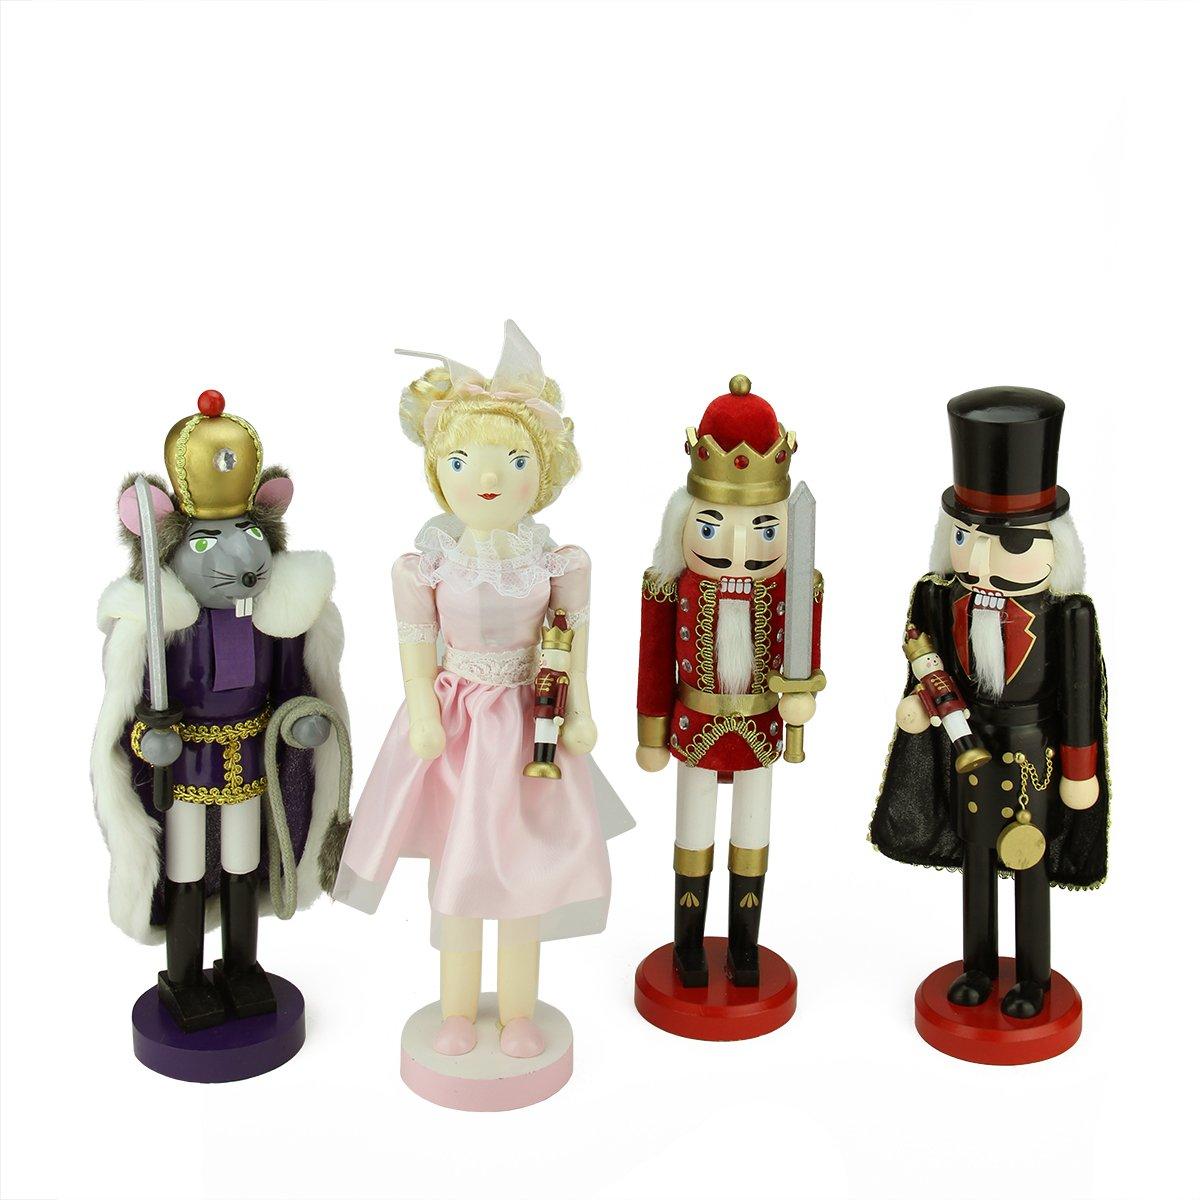 Northlight Decorative Wooden Nutcracker Suite Ballet Christmas Decorations, Set of 4